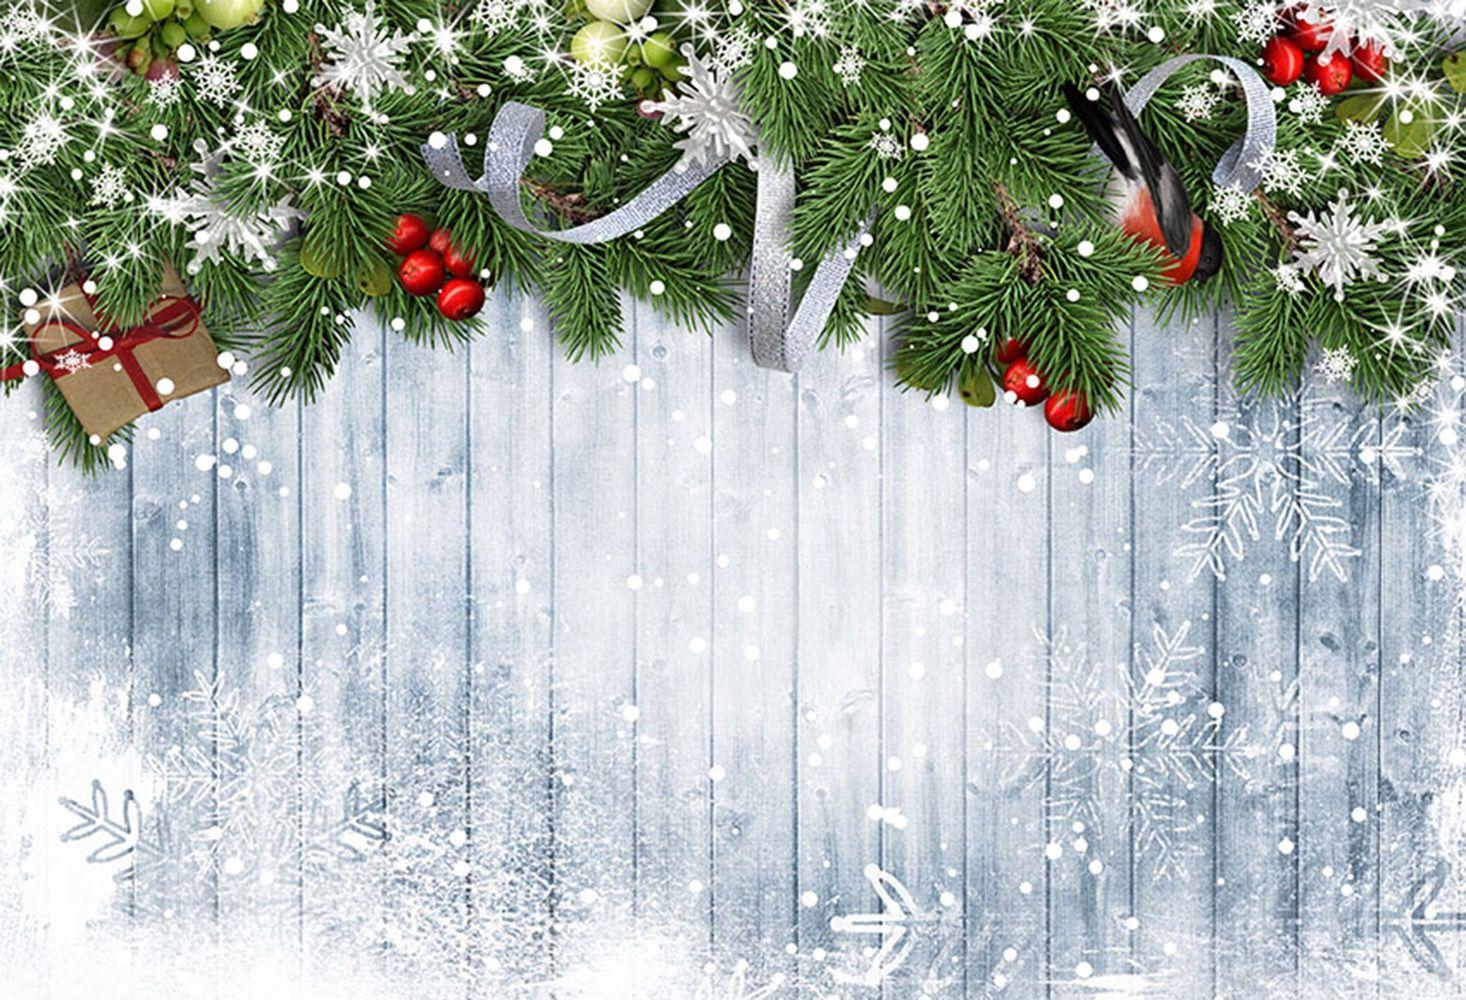 Merry Christmas Photo Photography Backdrop Wall Floor Studio Background Xmas